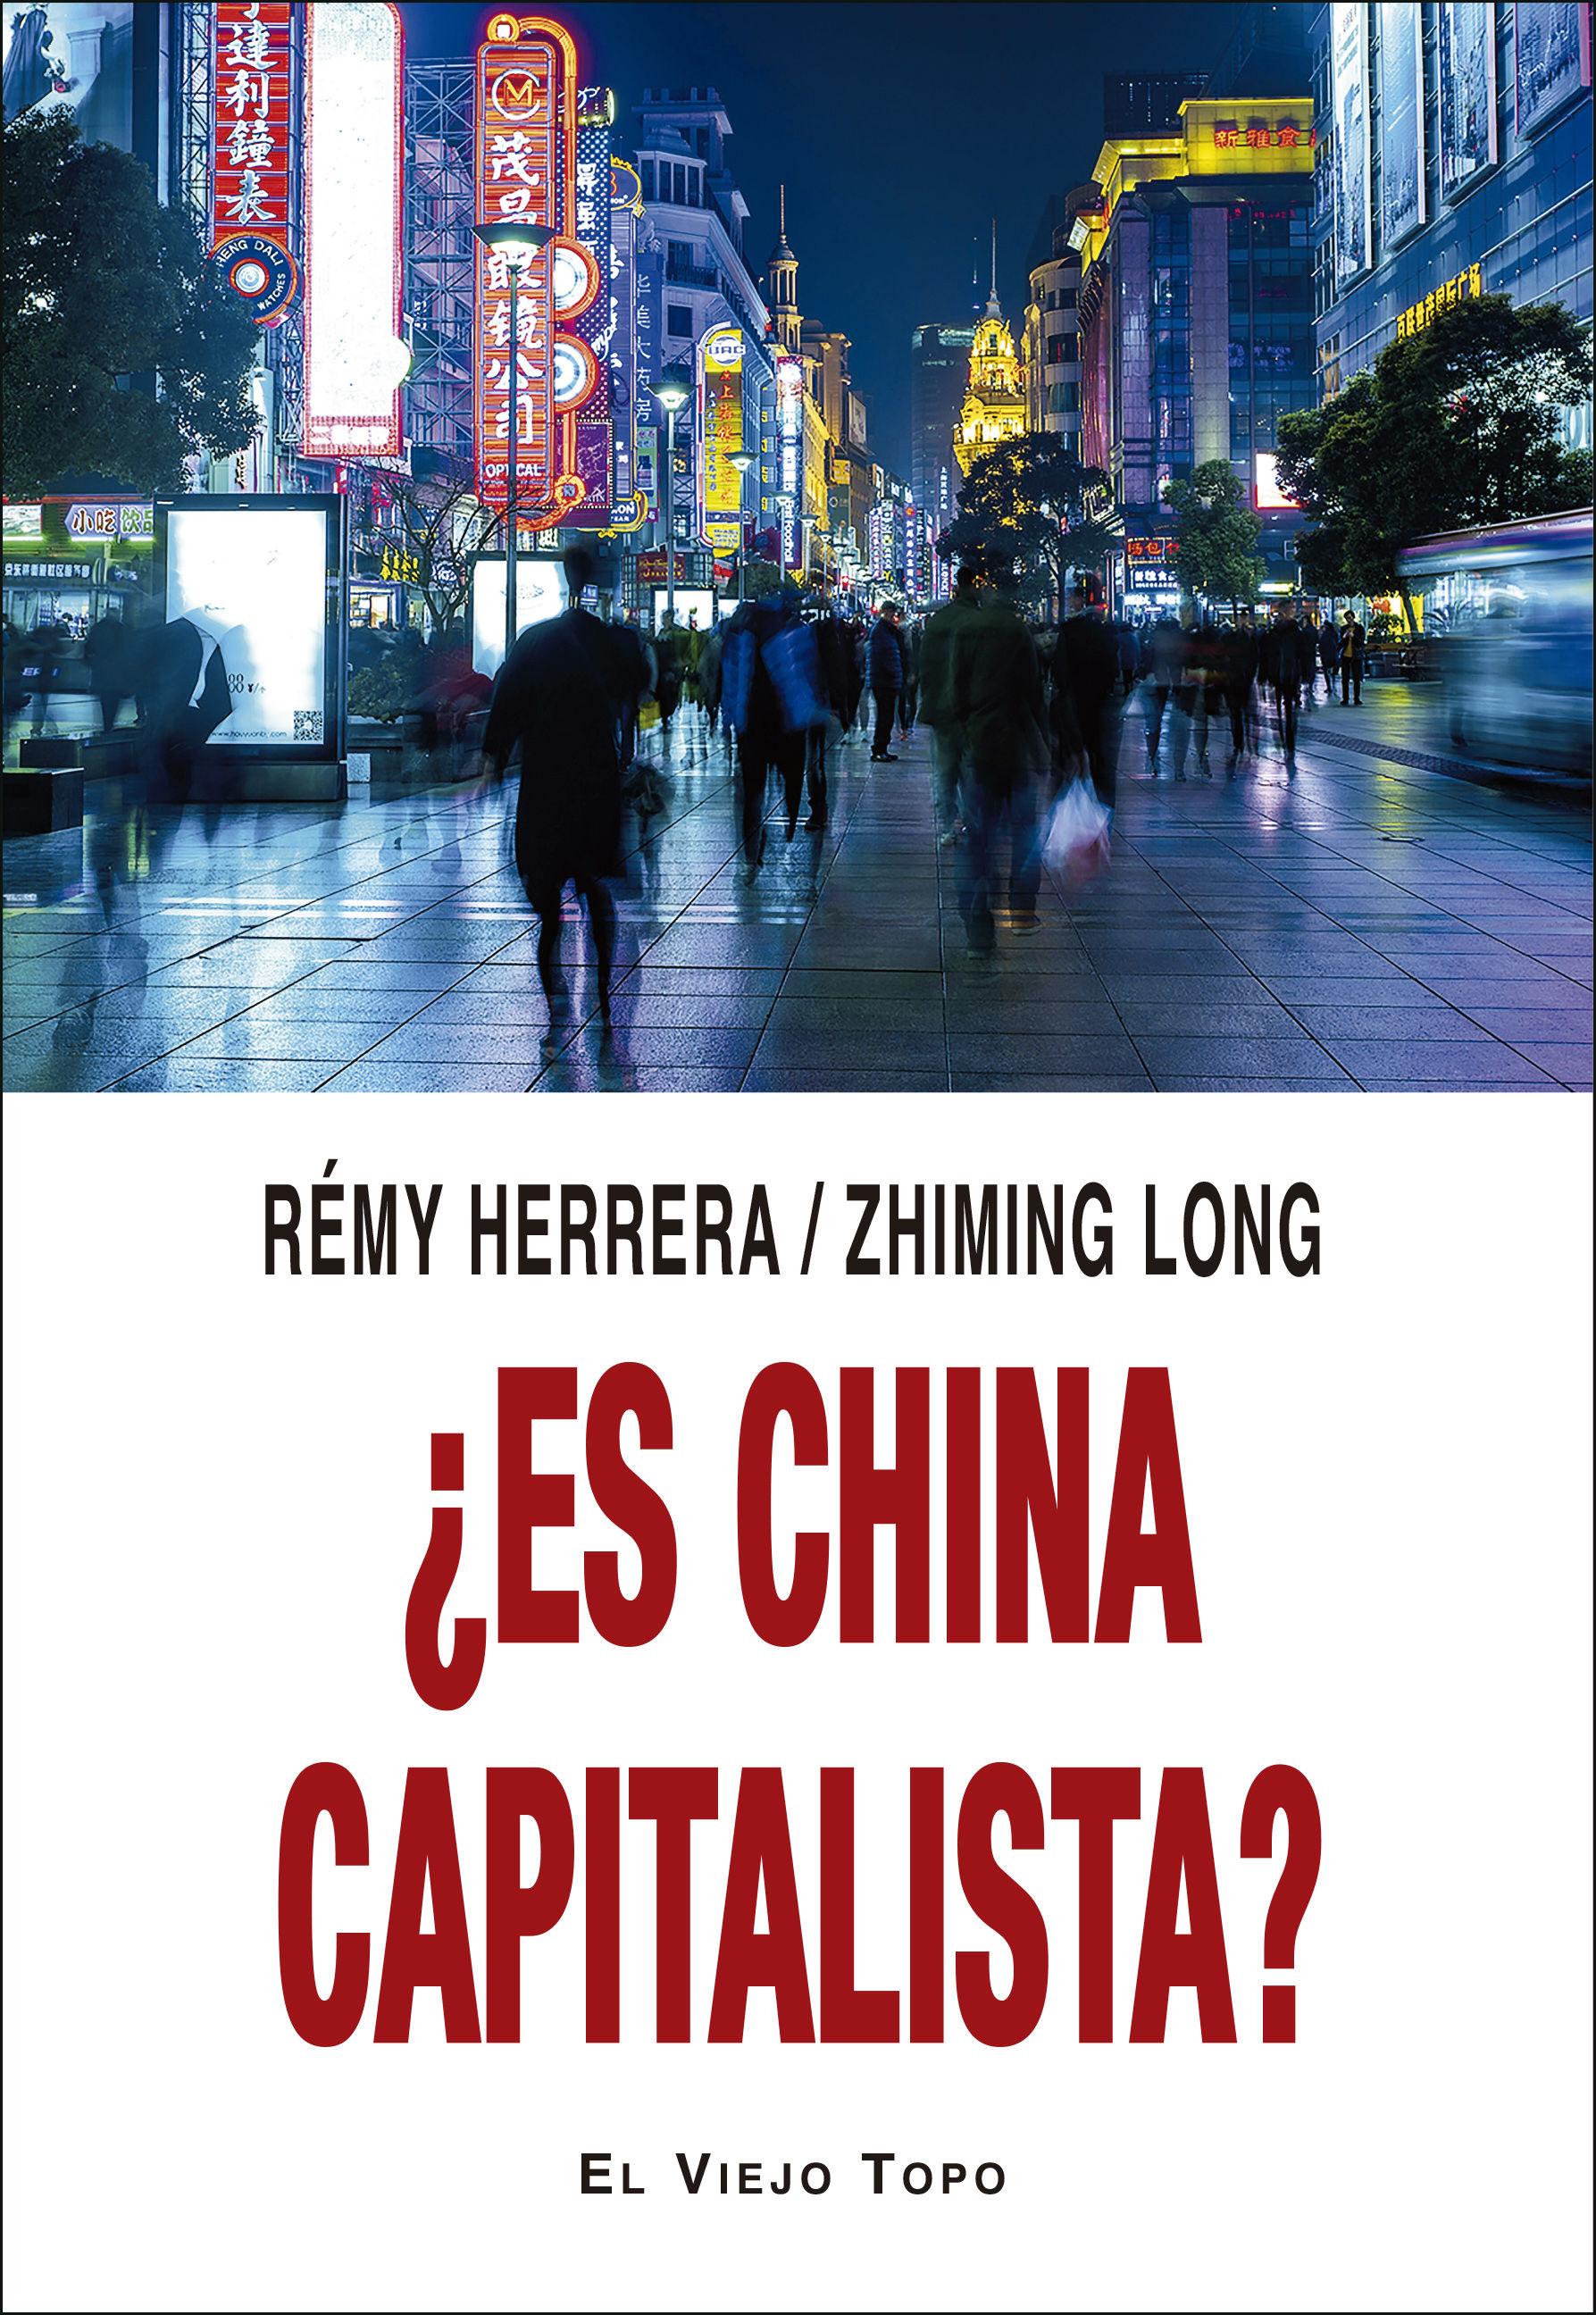 ES CHINA CAPITALISTA?